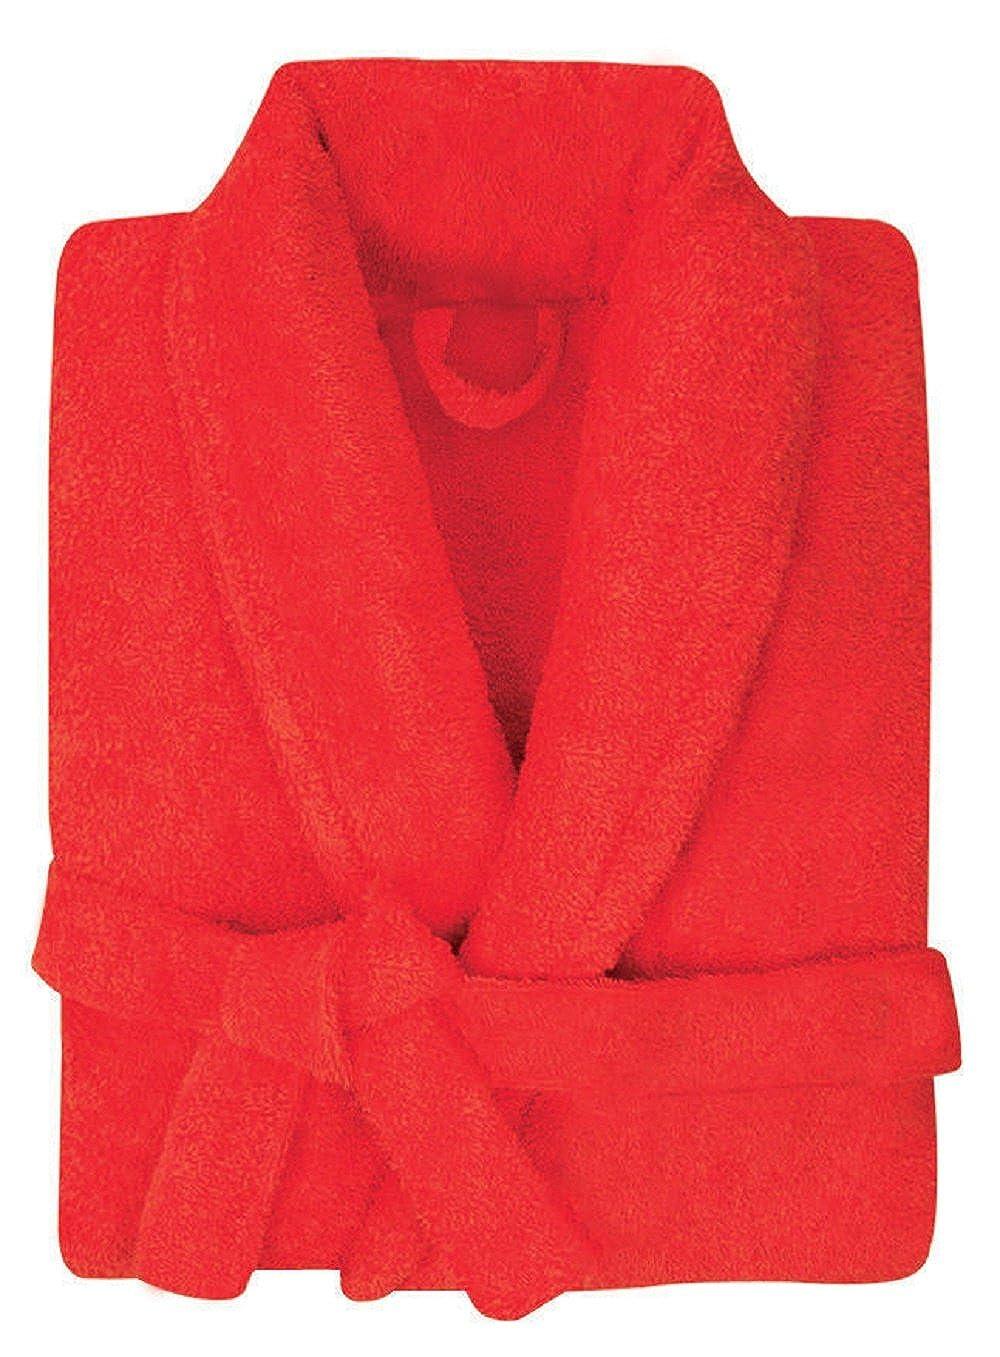 Ladies/Mens Luxury 100% Cotton Towelling Bath Robe Dressing Gown Wrap Nightwear